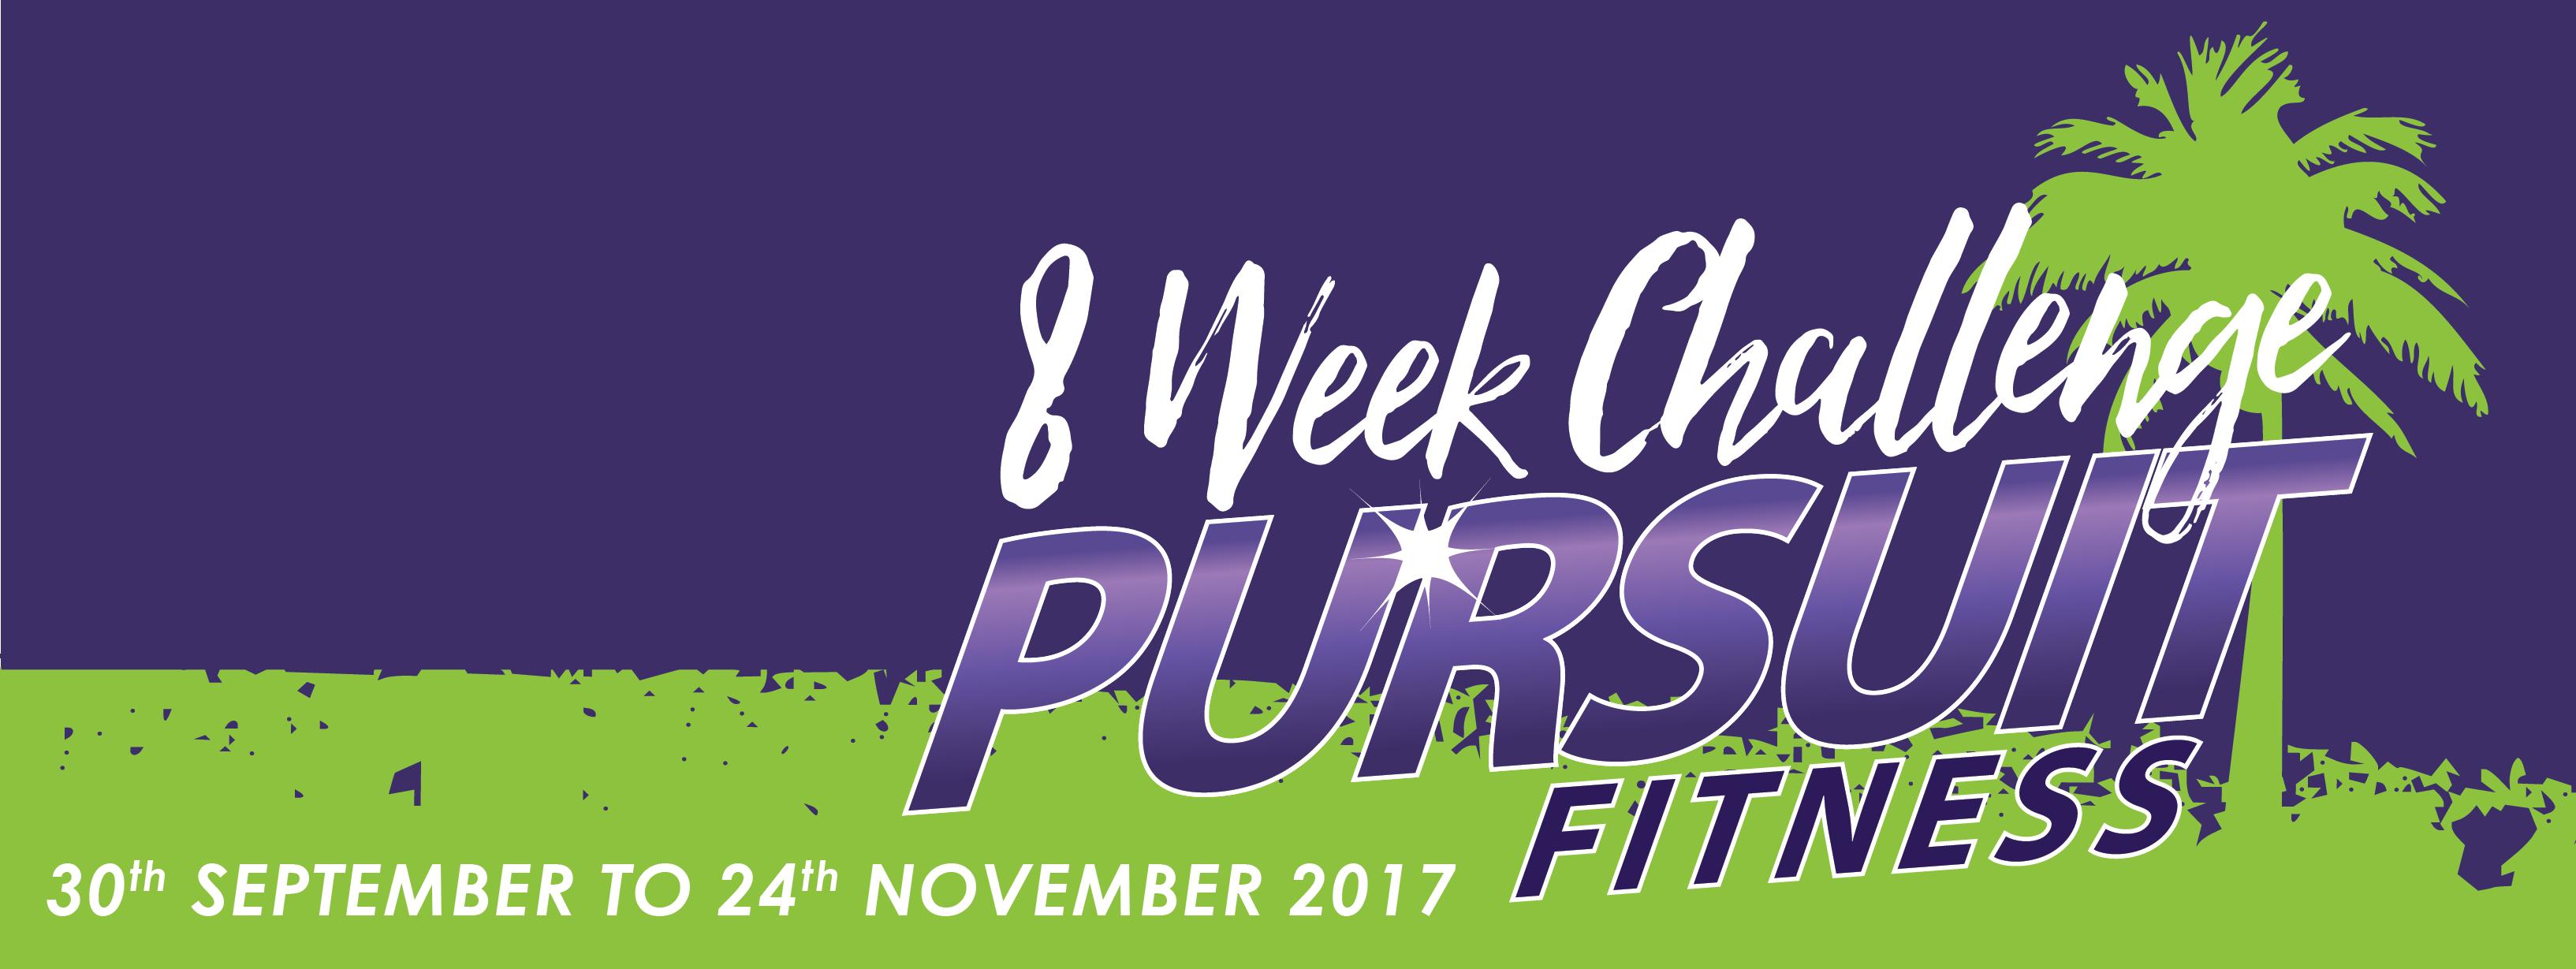 pursuit fitness 8 week challenge